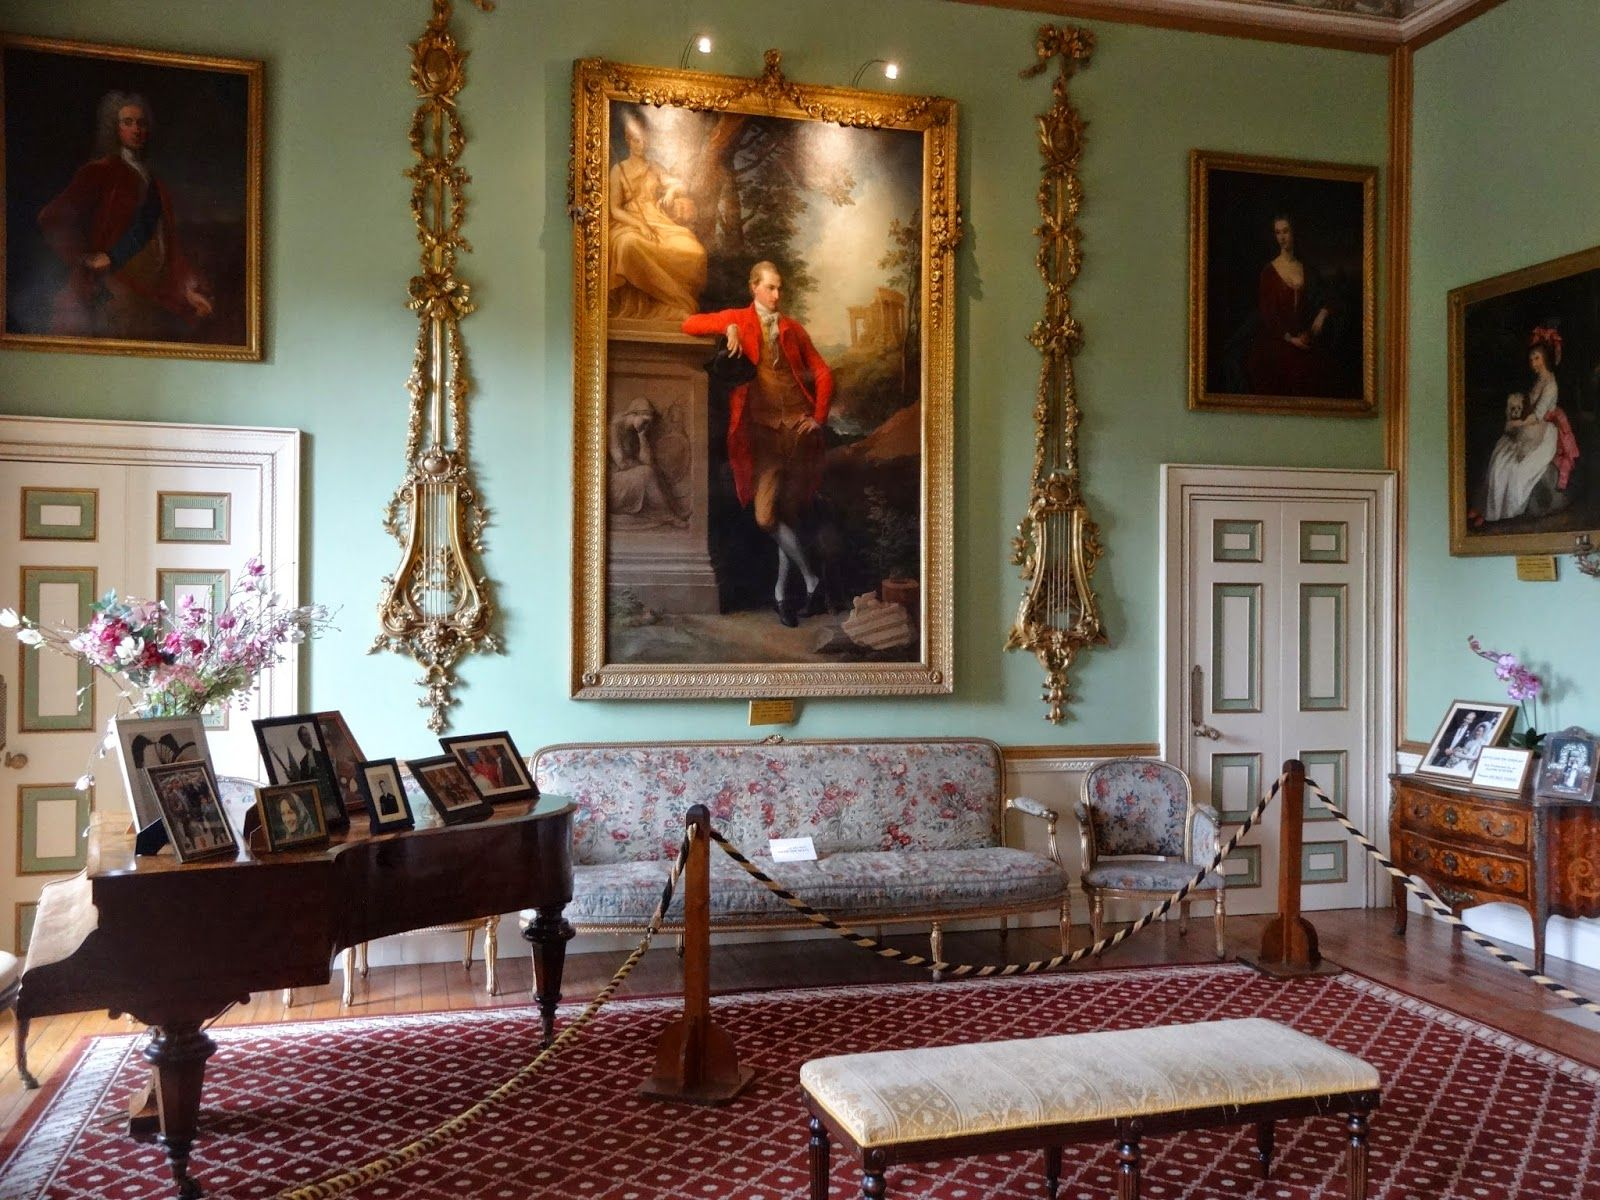 hopetoun house interior - Google Search   A Way of Living ...